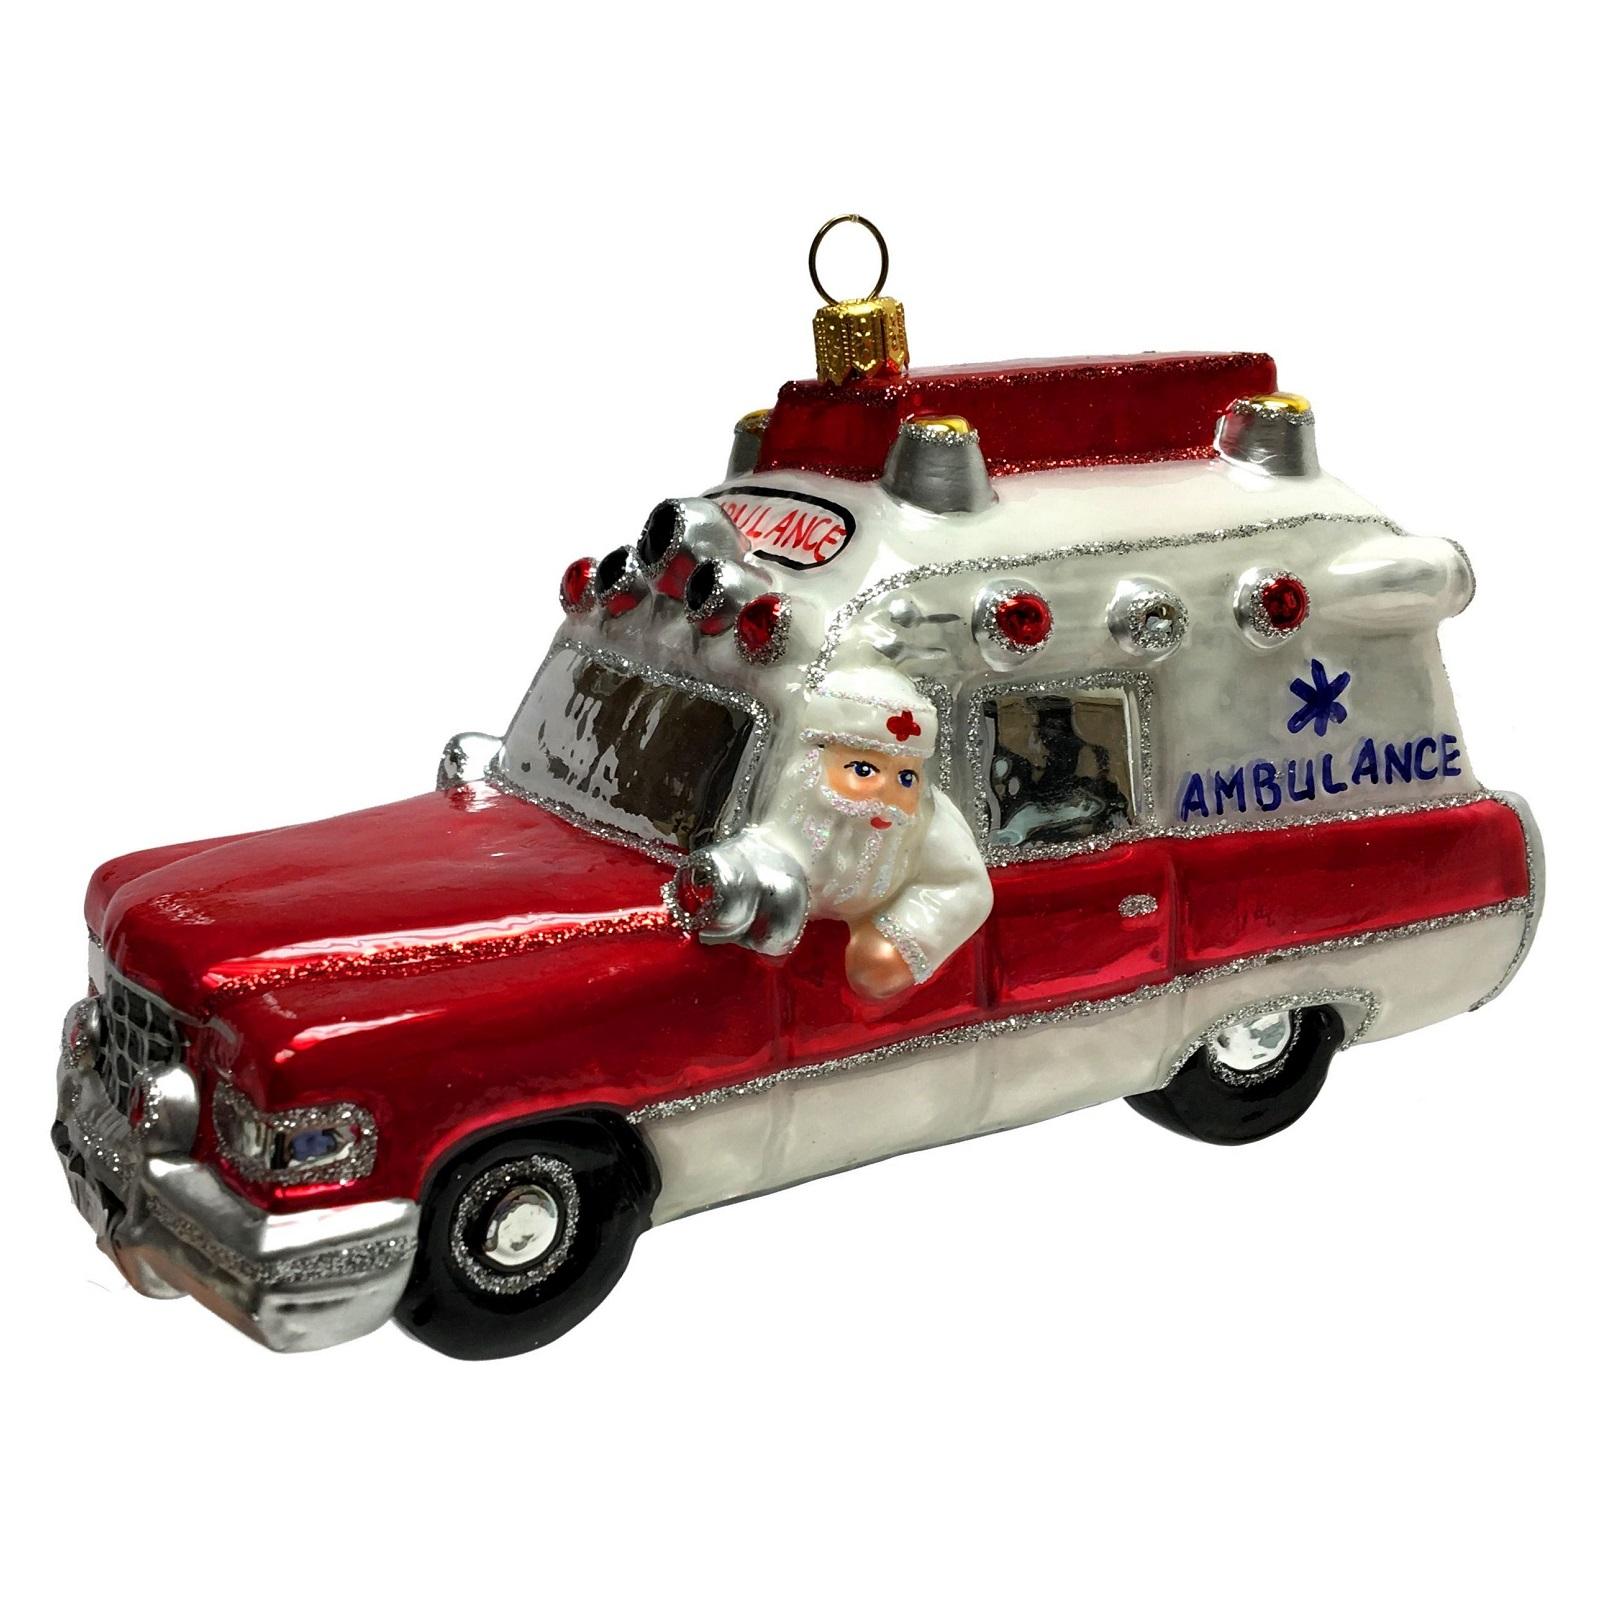 Ambulance Christmas Ornaments